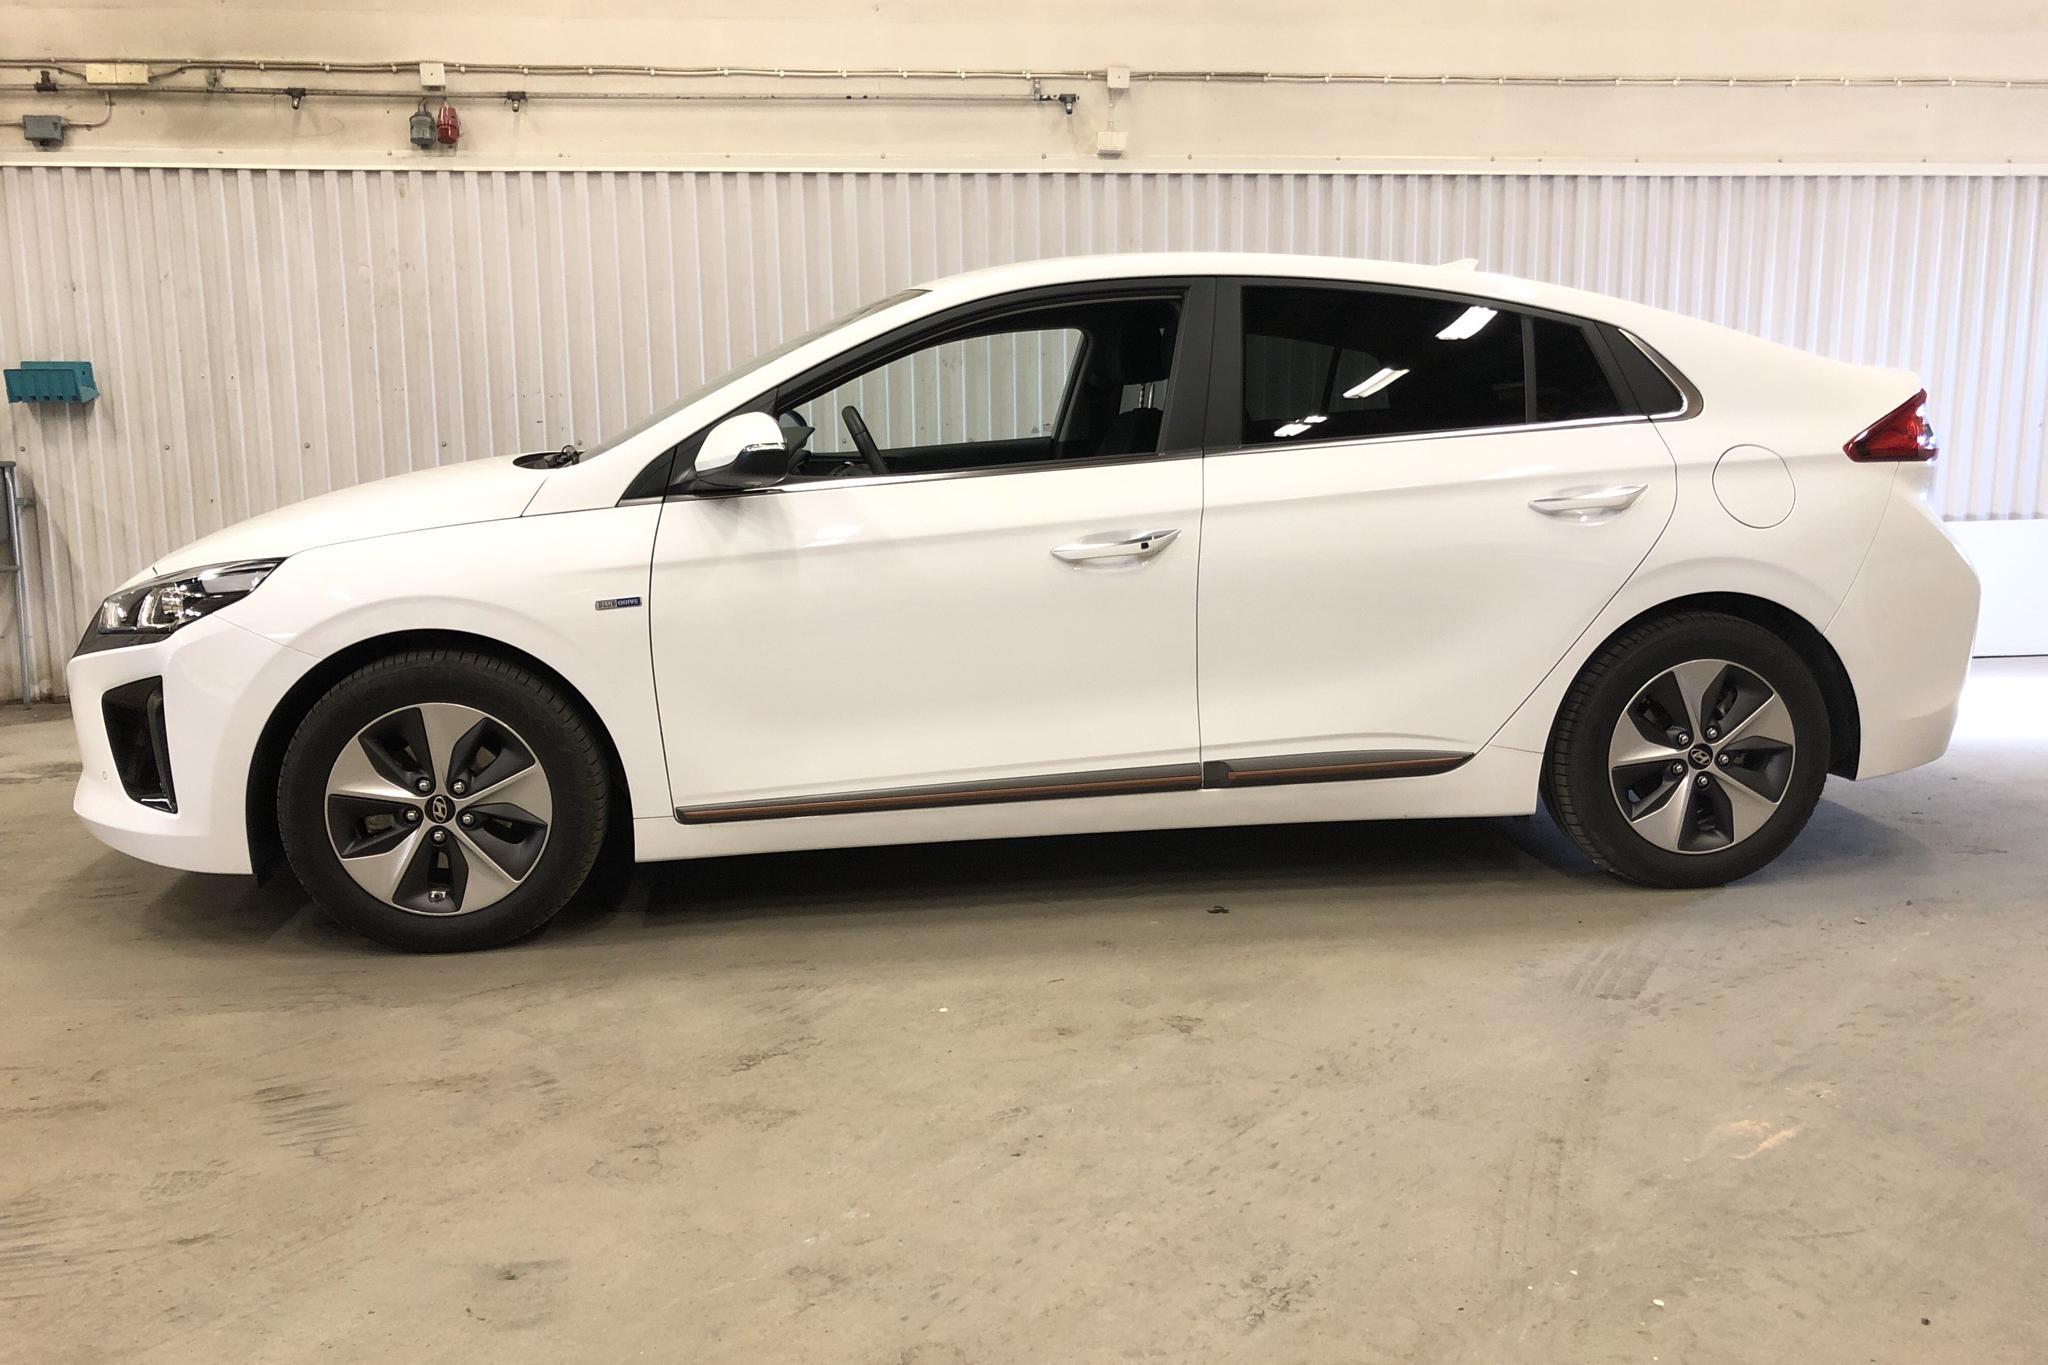 Hyundai IONIQ Electric (120hk) - 7 340 km - Automatic - white - 2019